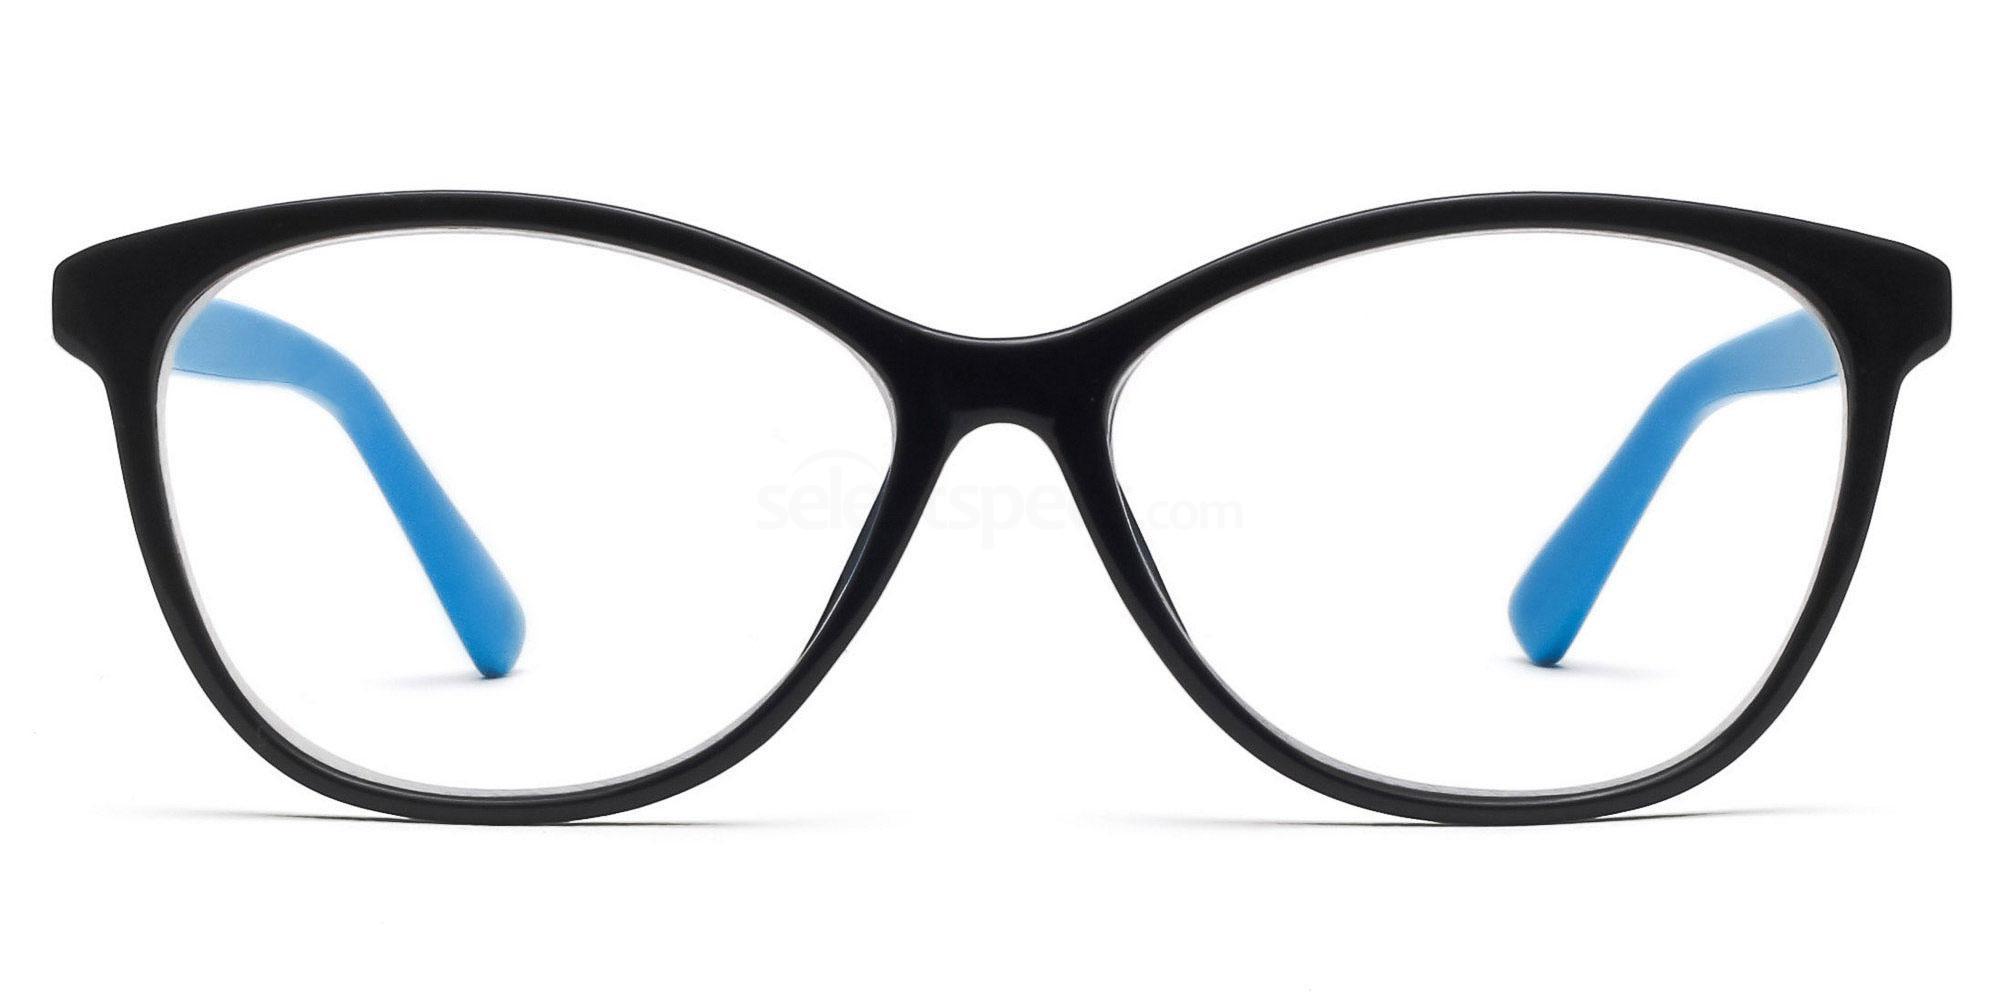 COL.88 2439 - Black and Blue Glasses, SelectSpecs